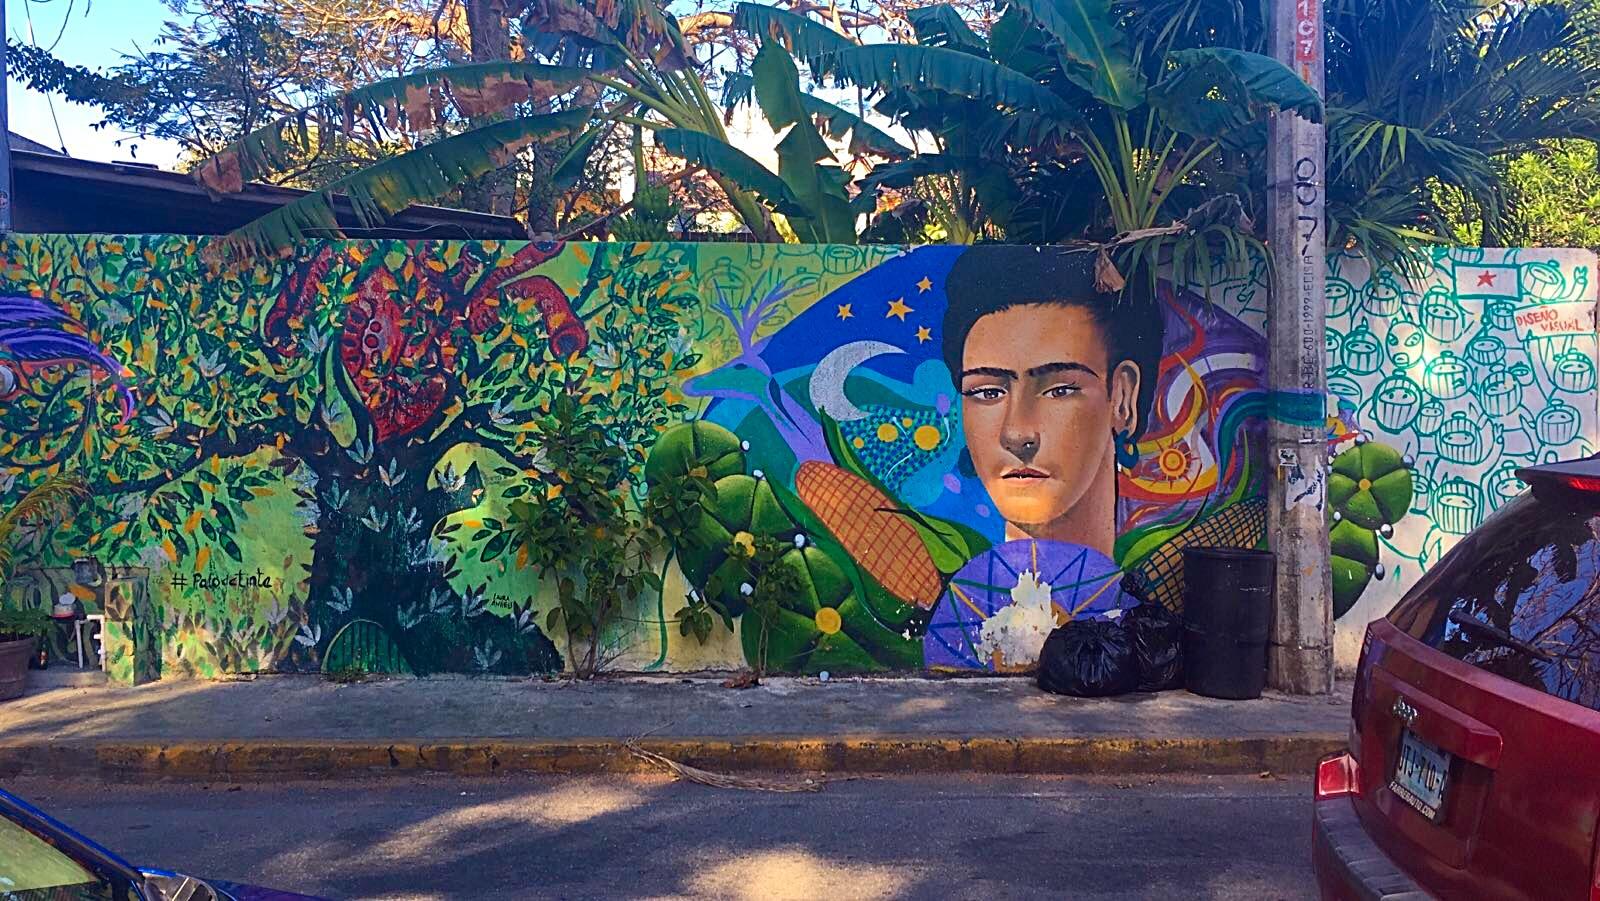 Playa del Carmen Murals_StreetArt-6